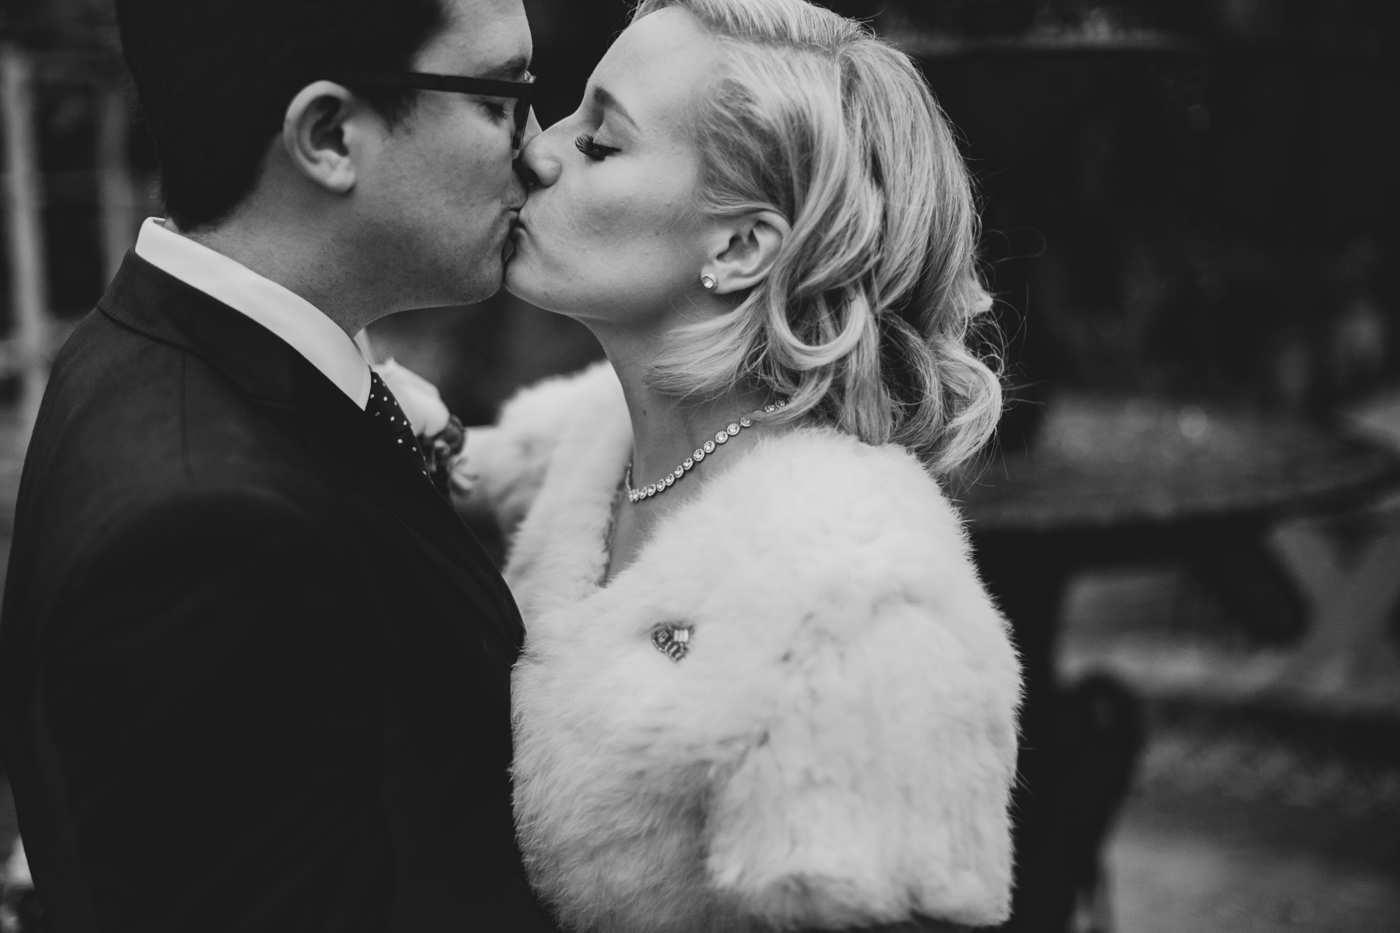 Jo & Tom Wedding - The Grounds of Alexandria - Samantha Heather Photography-227.jpg